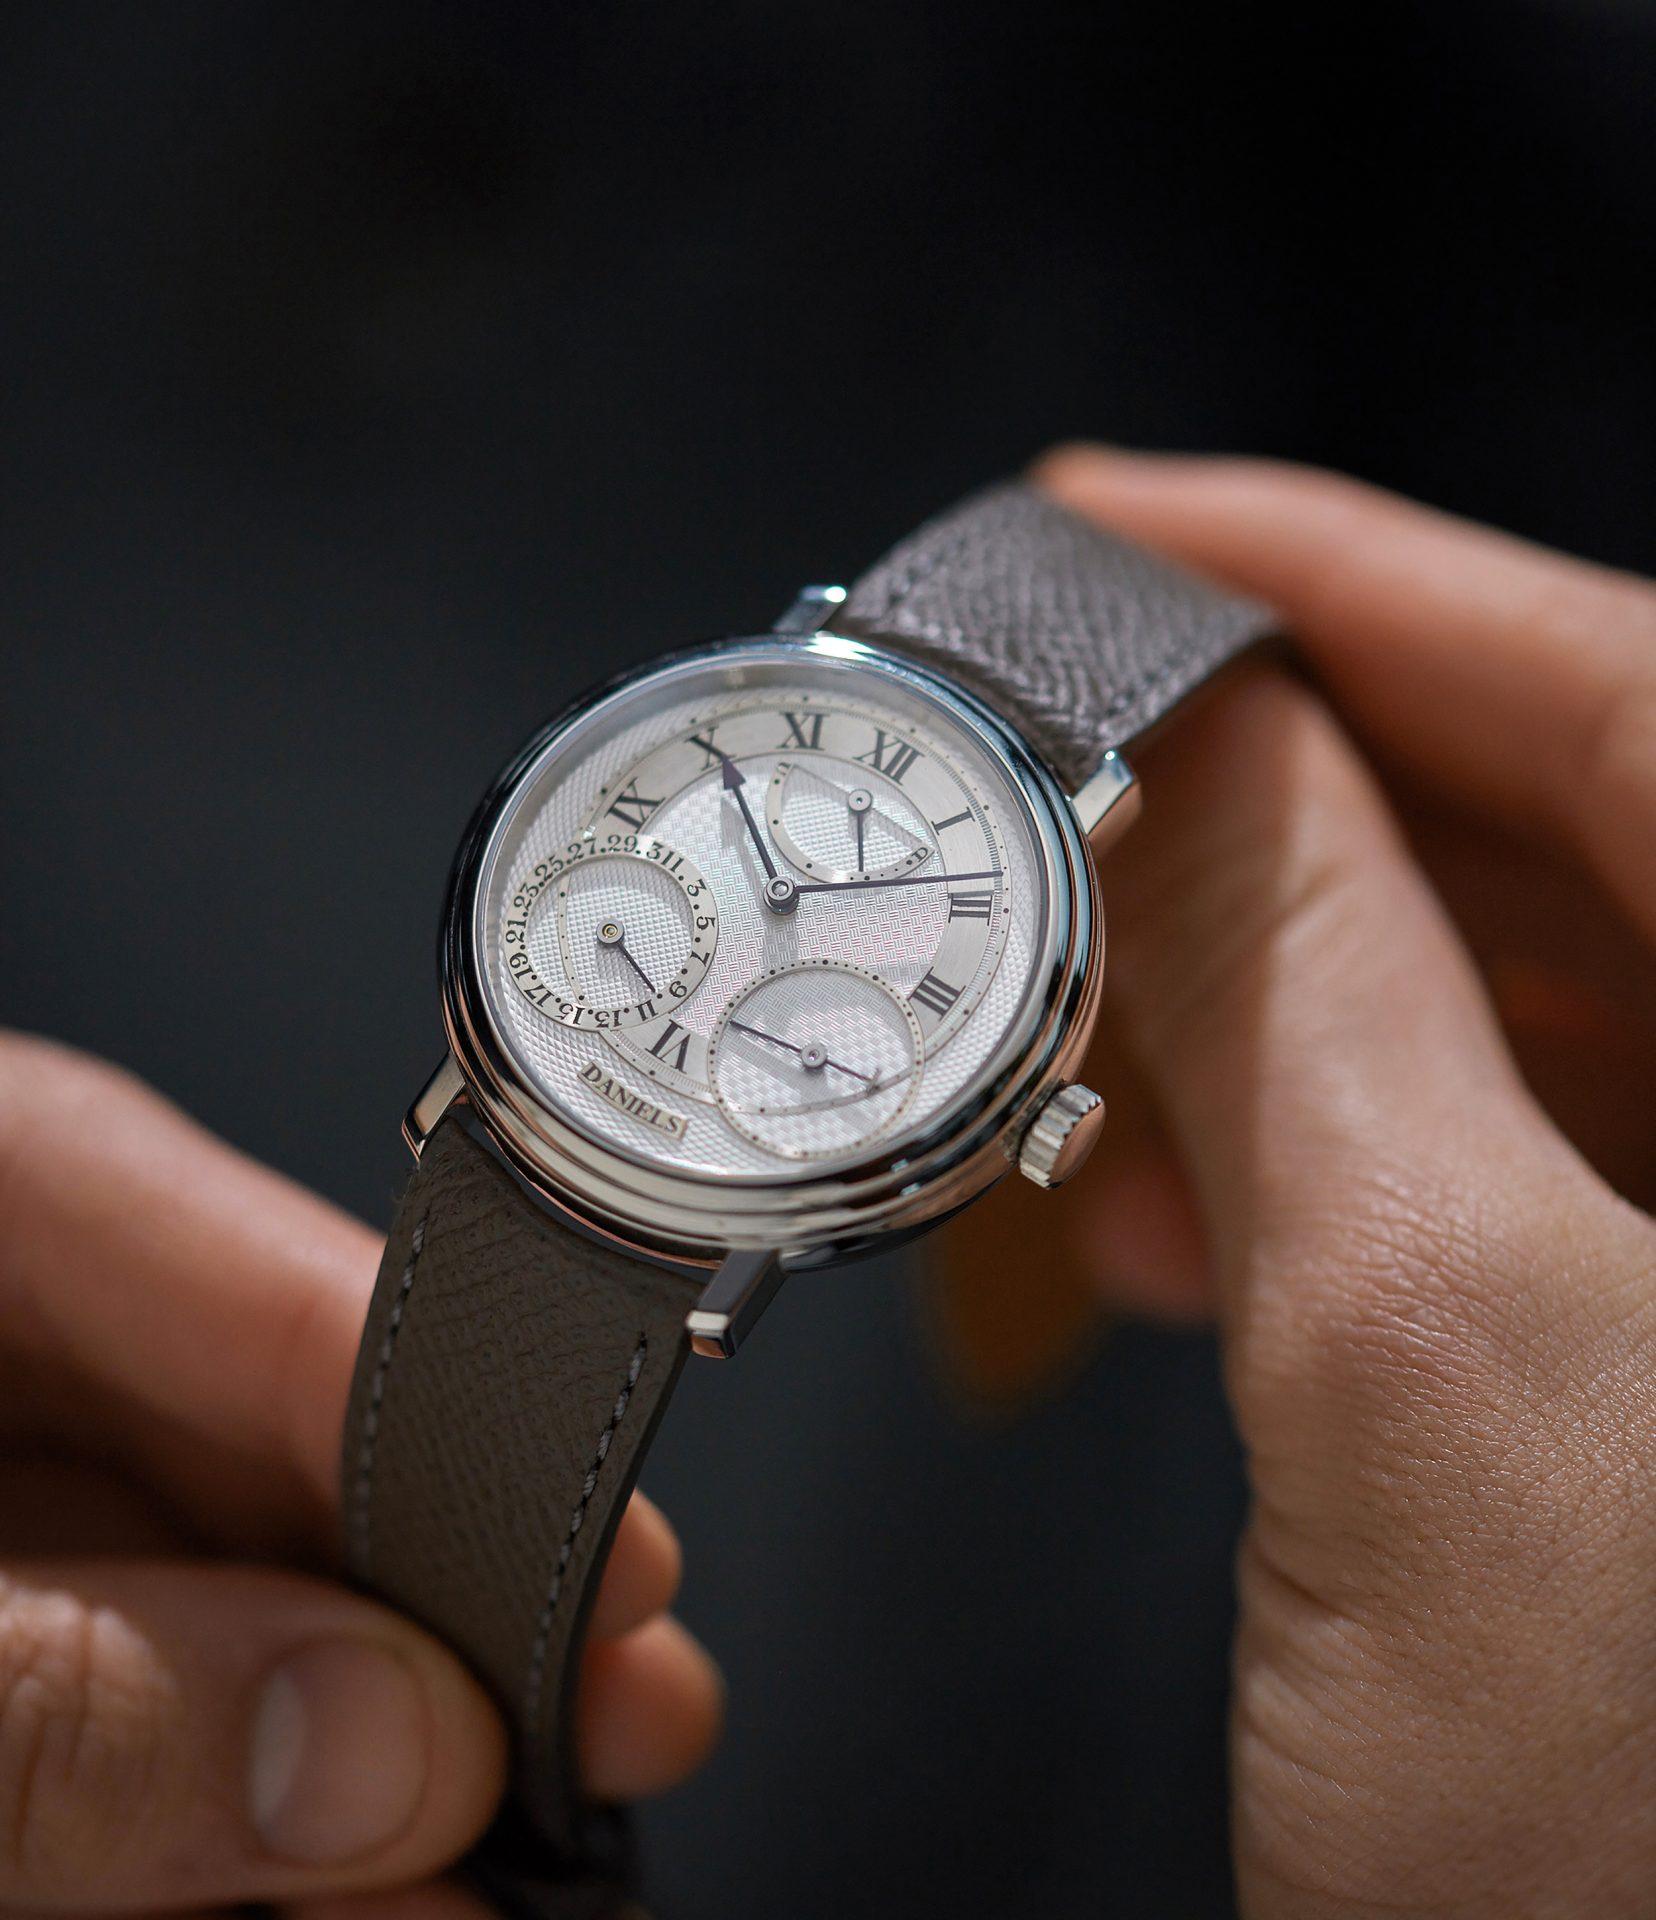 A Collected Man la casa de relojes usados independientes George Daniels